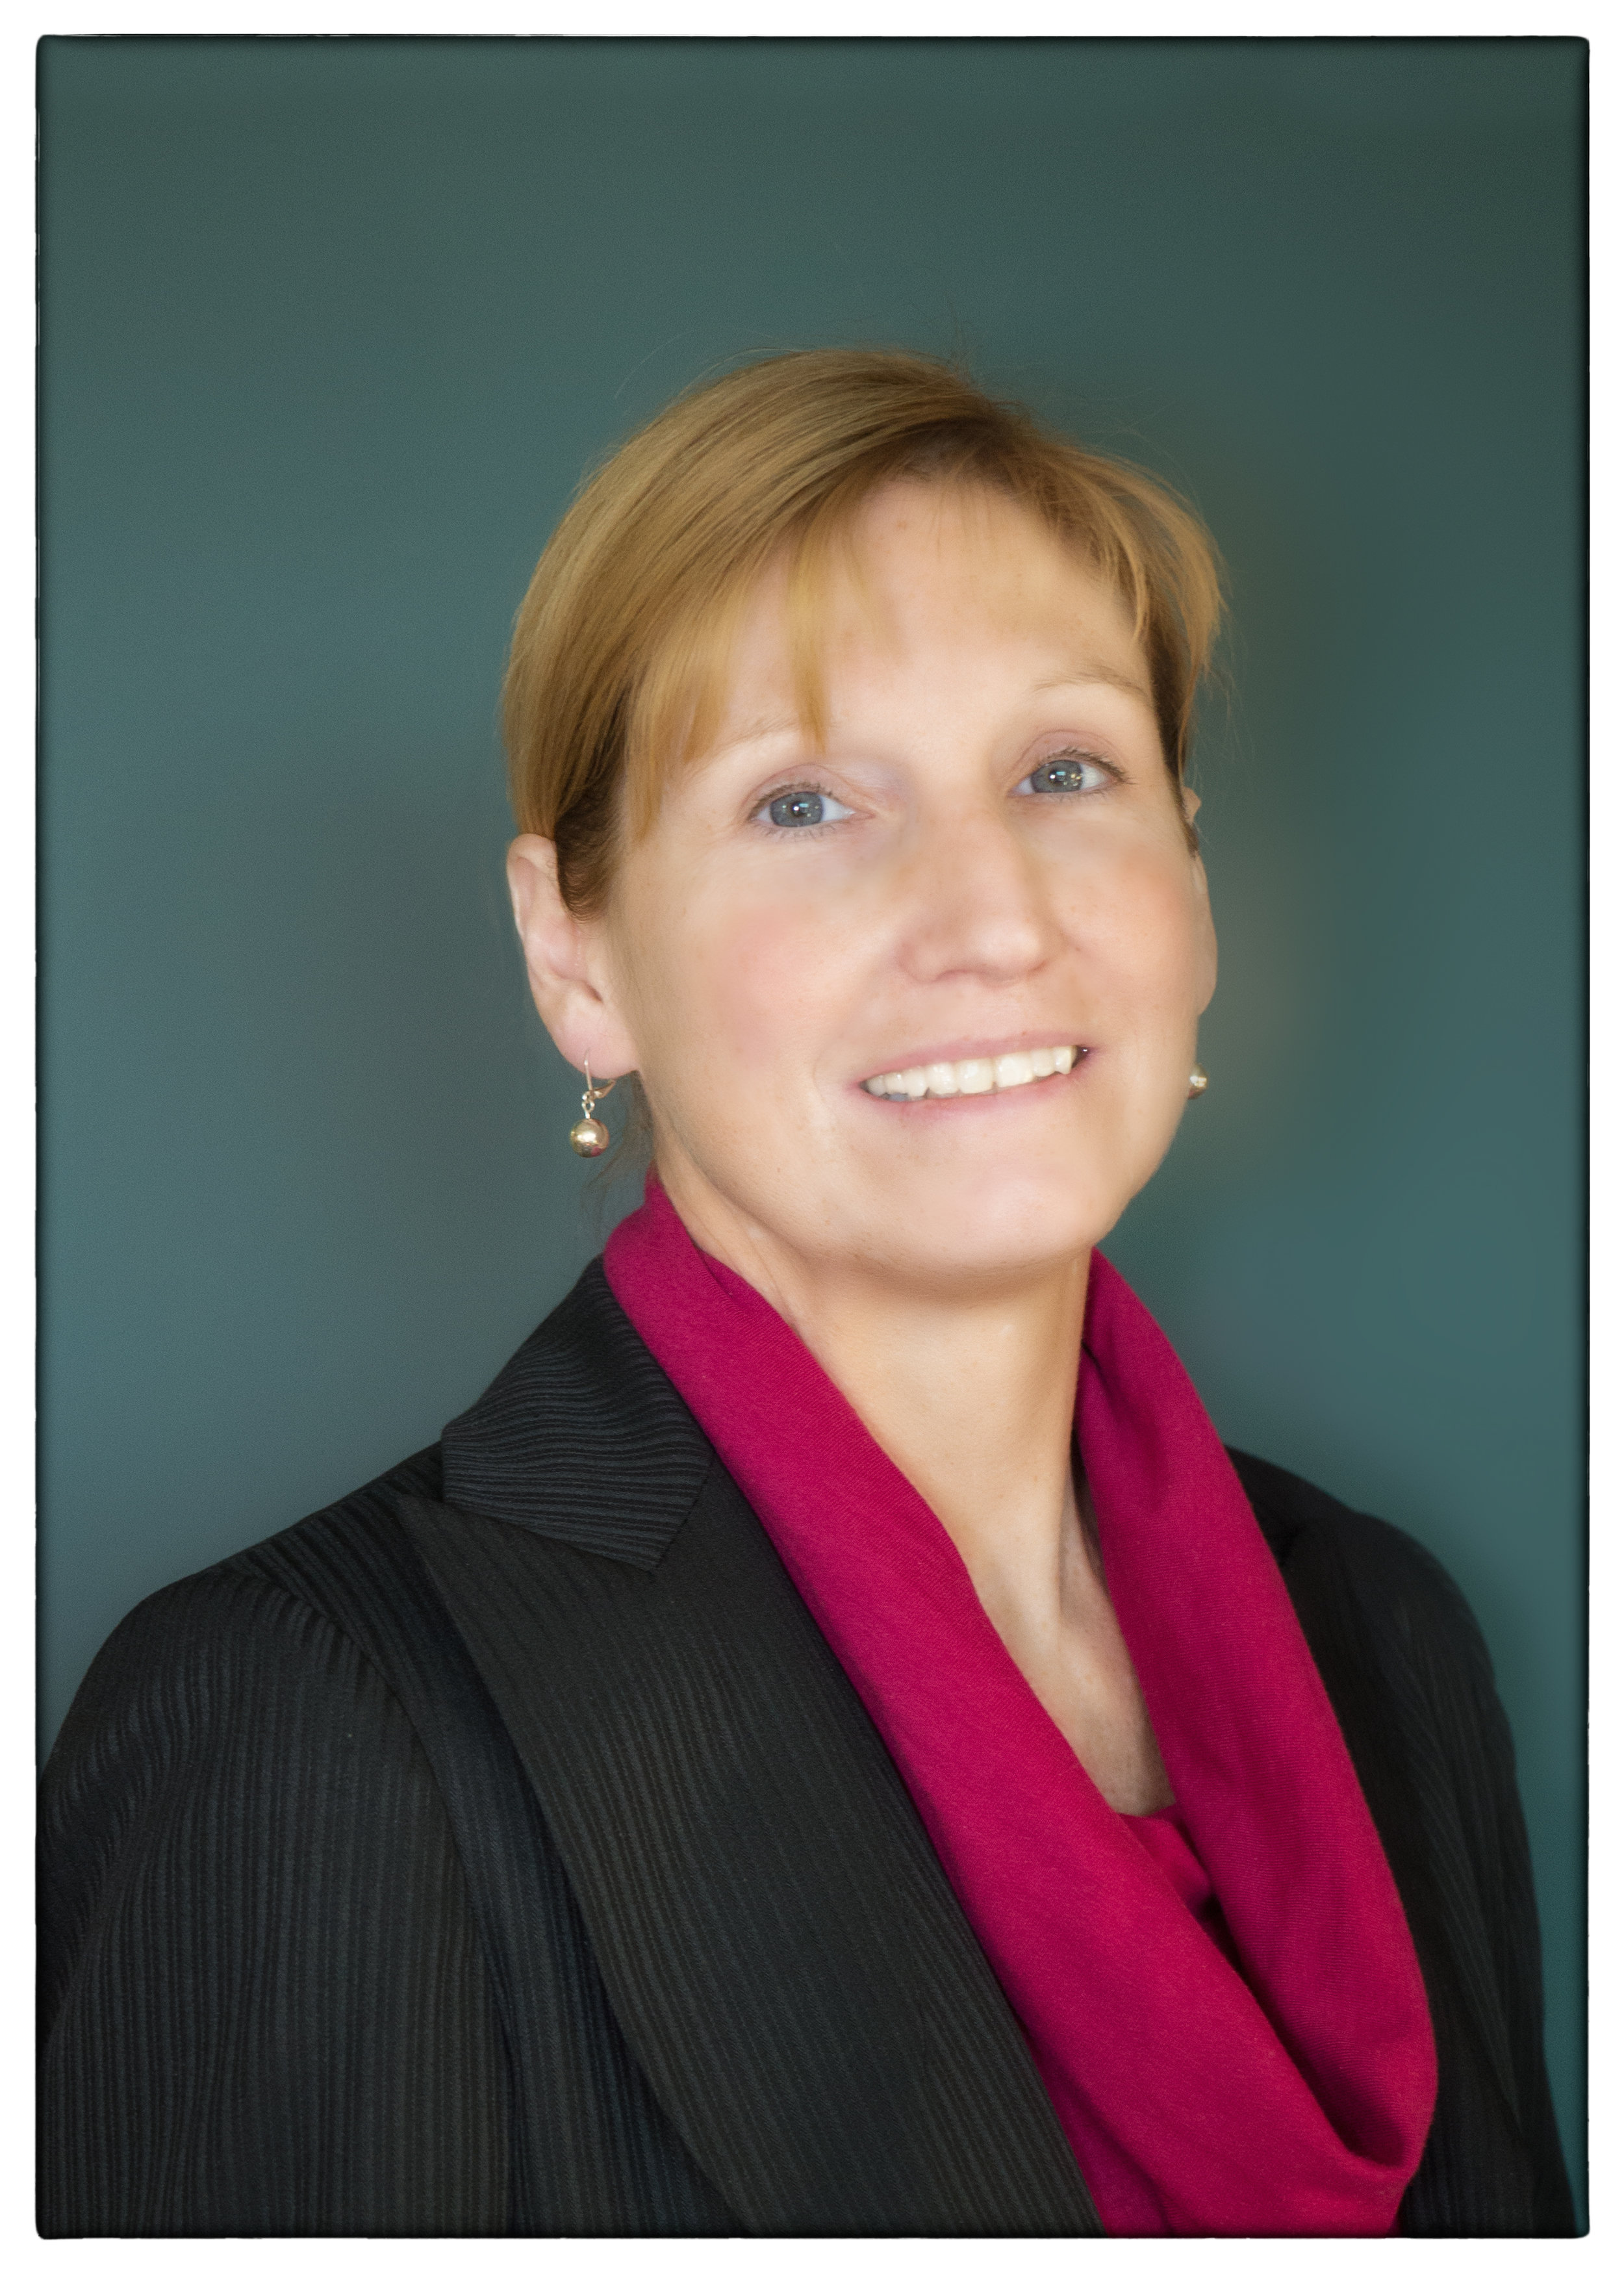 Attorney Deborah L. Skurulsky